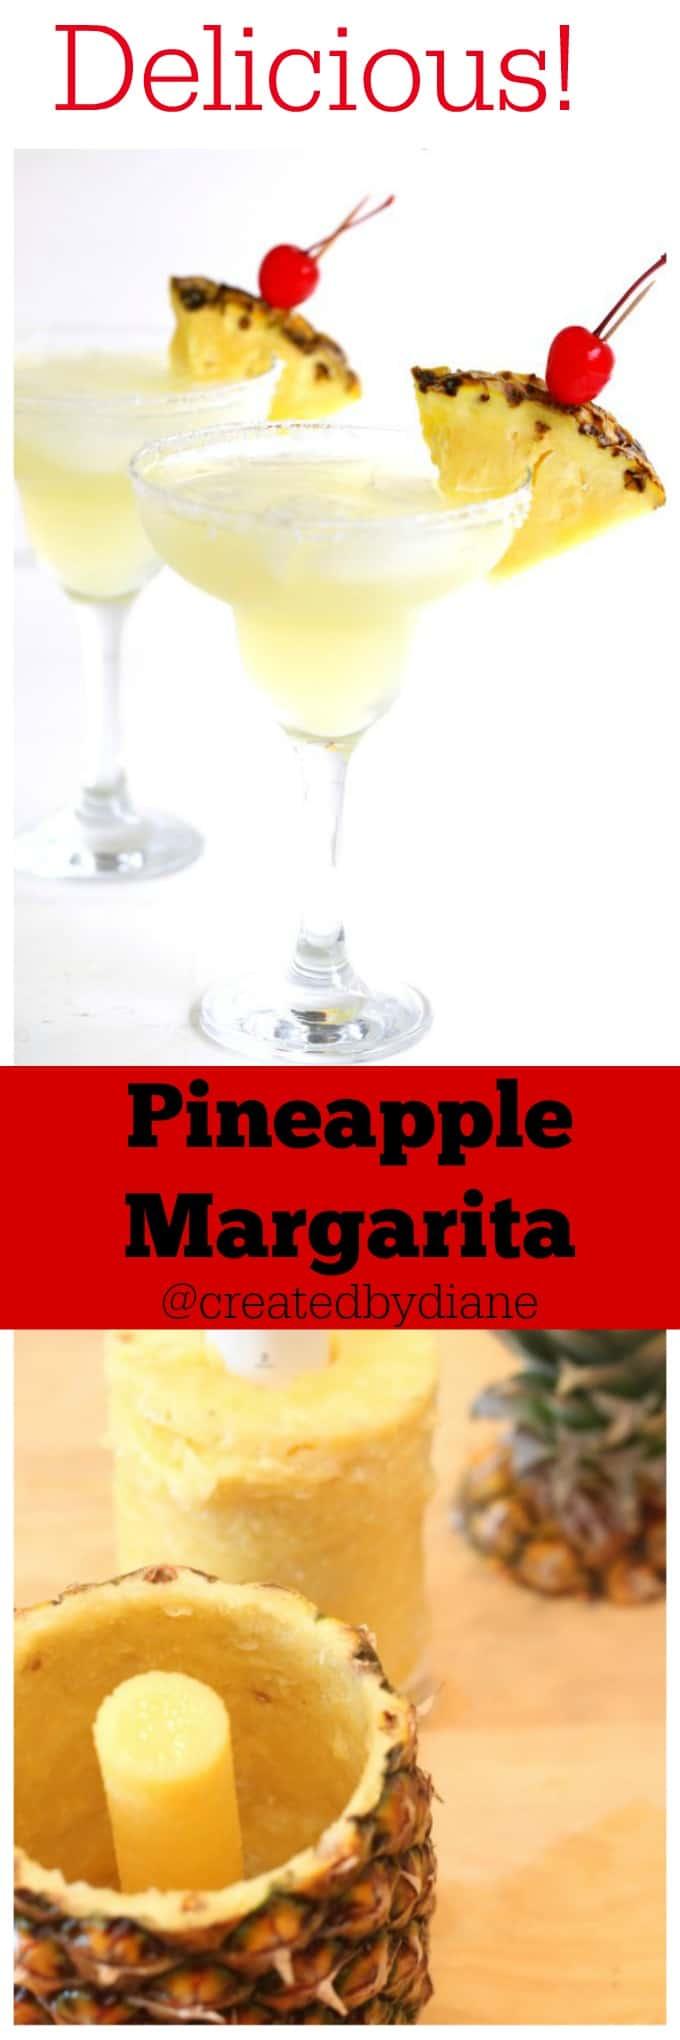 Pineapple Margarita @createdbydiane